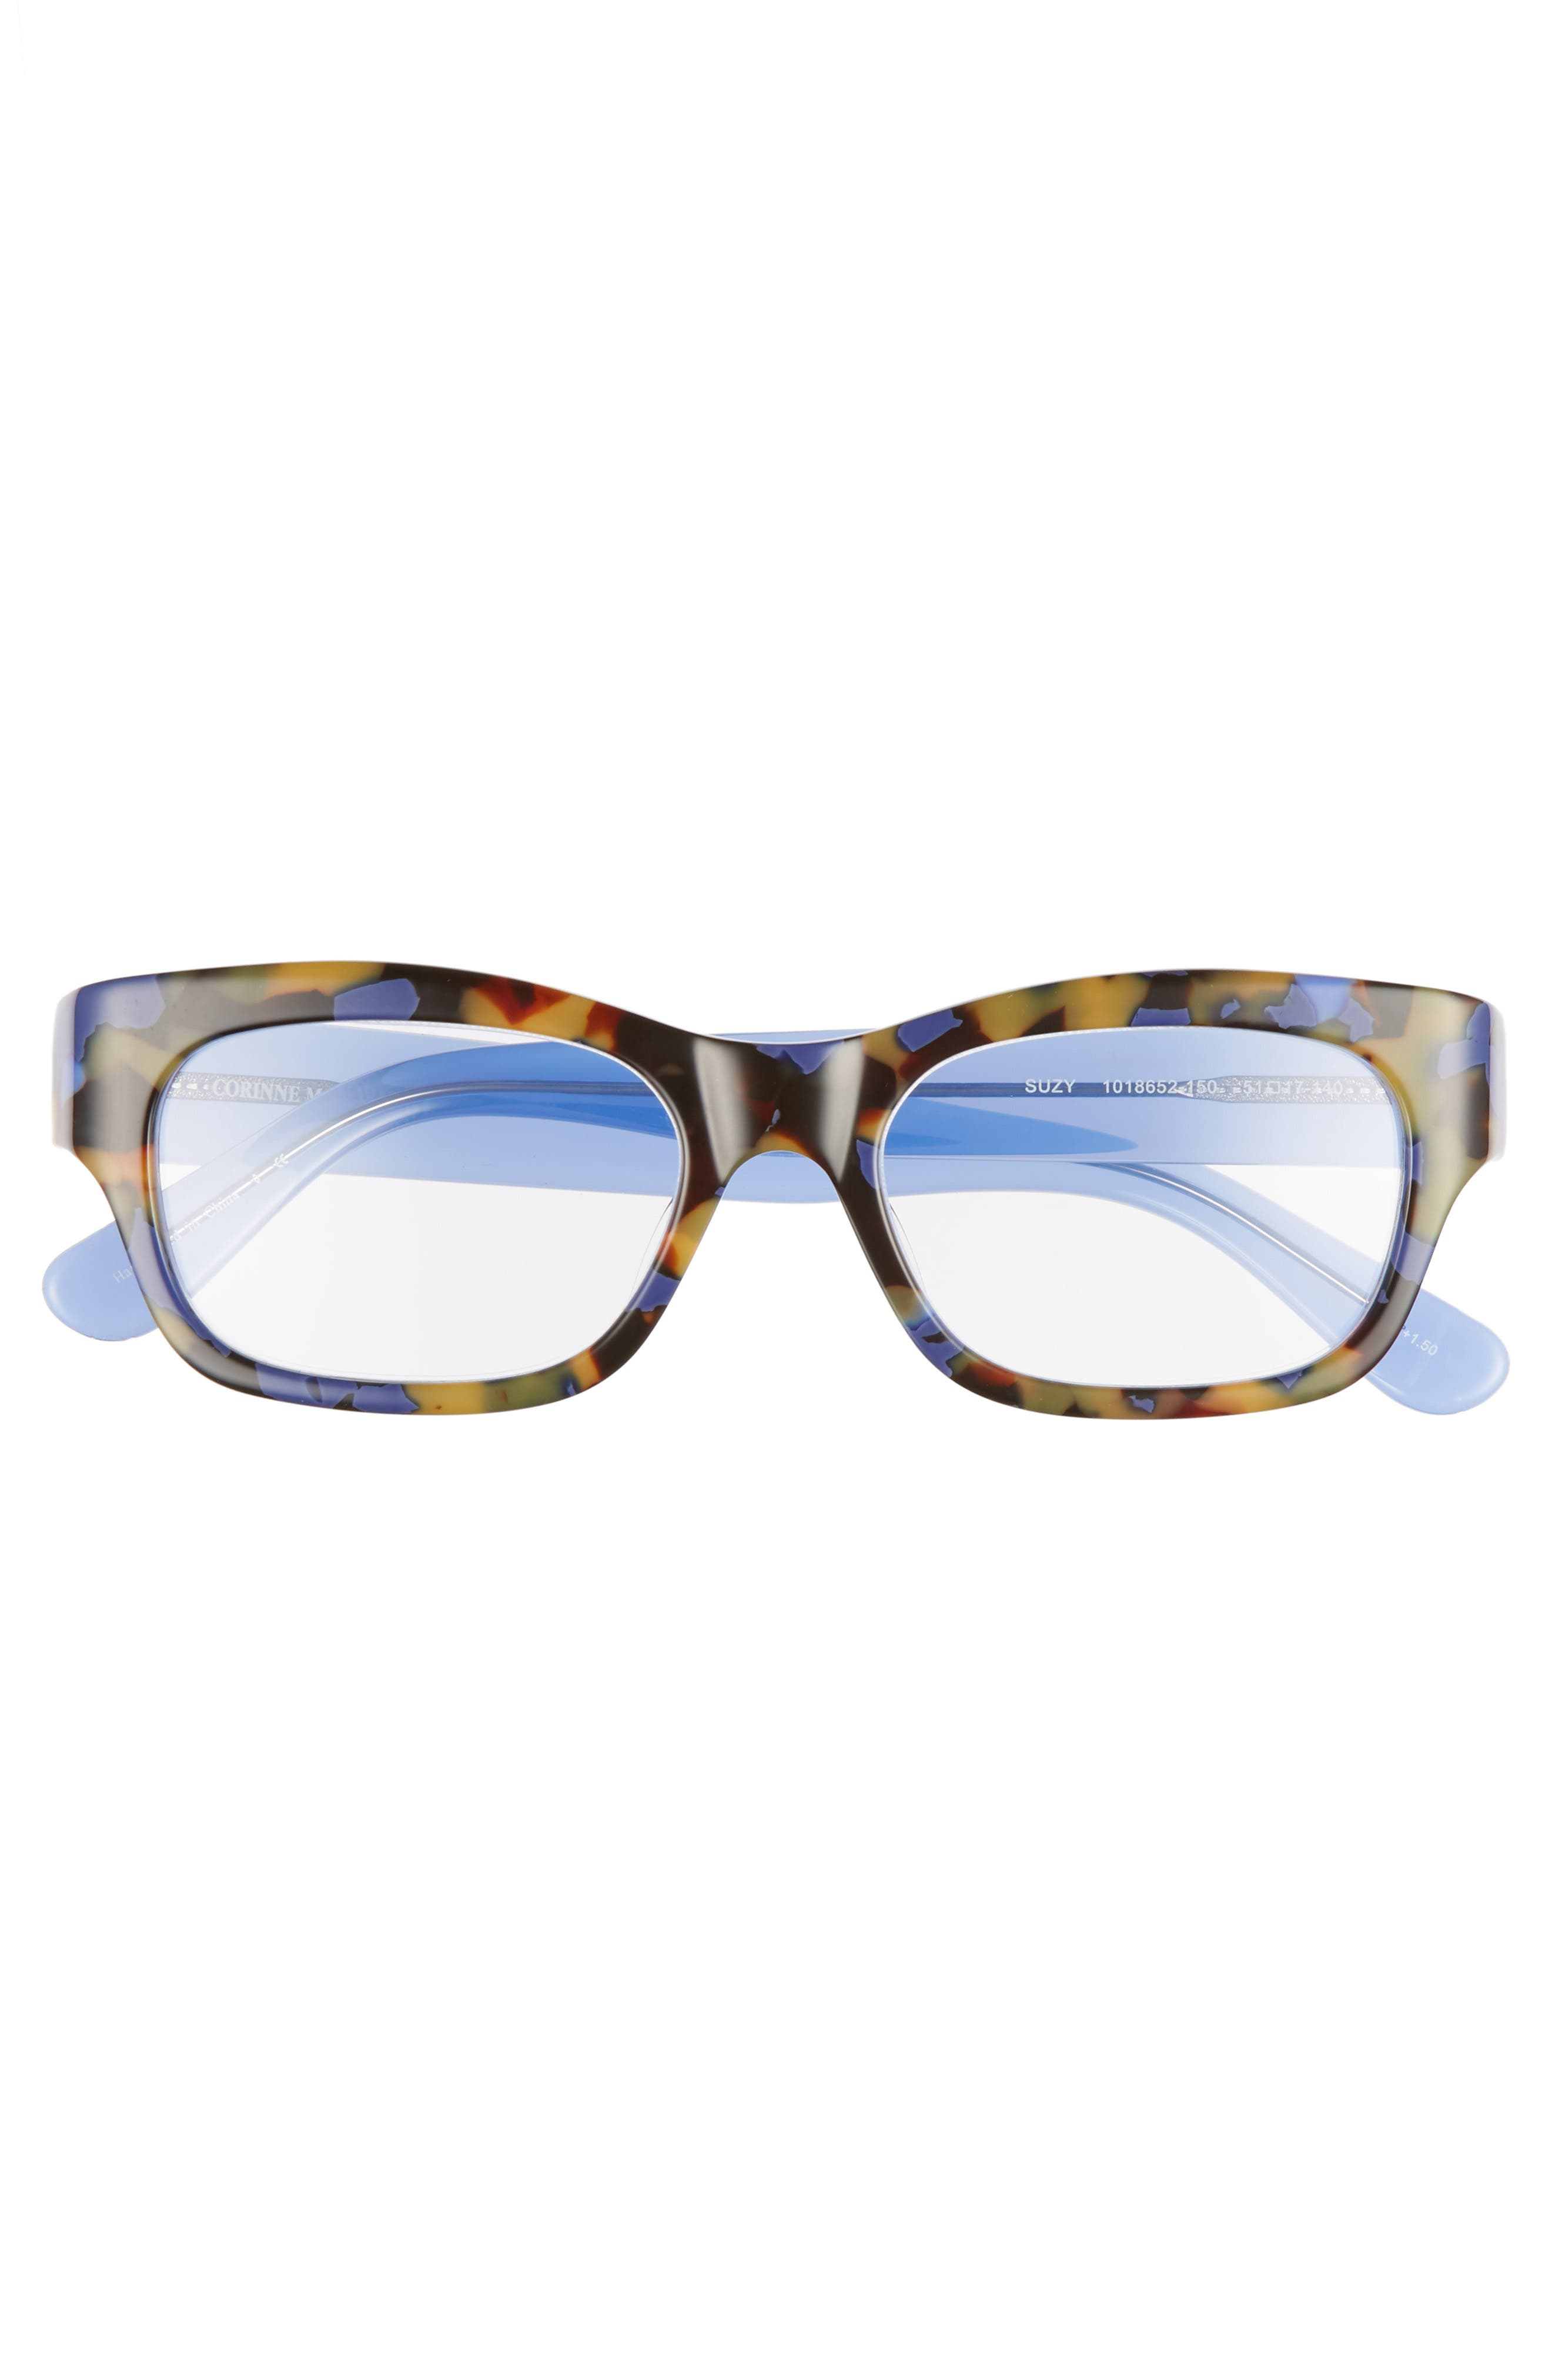 Suzy 51mm Reading Glasses,                             Alternate thumbnail 3, color,                             TORTOISE BLUE